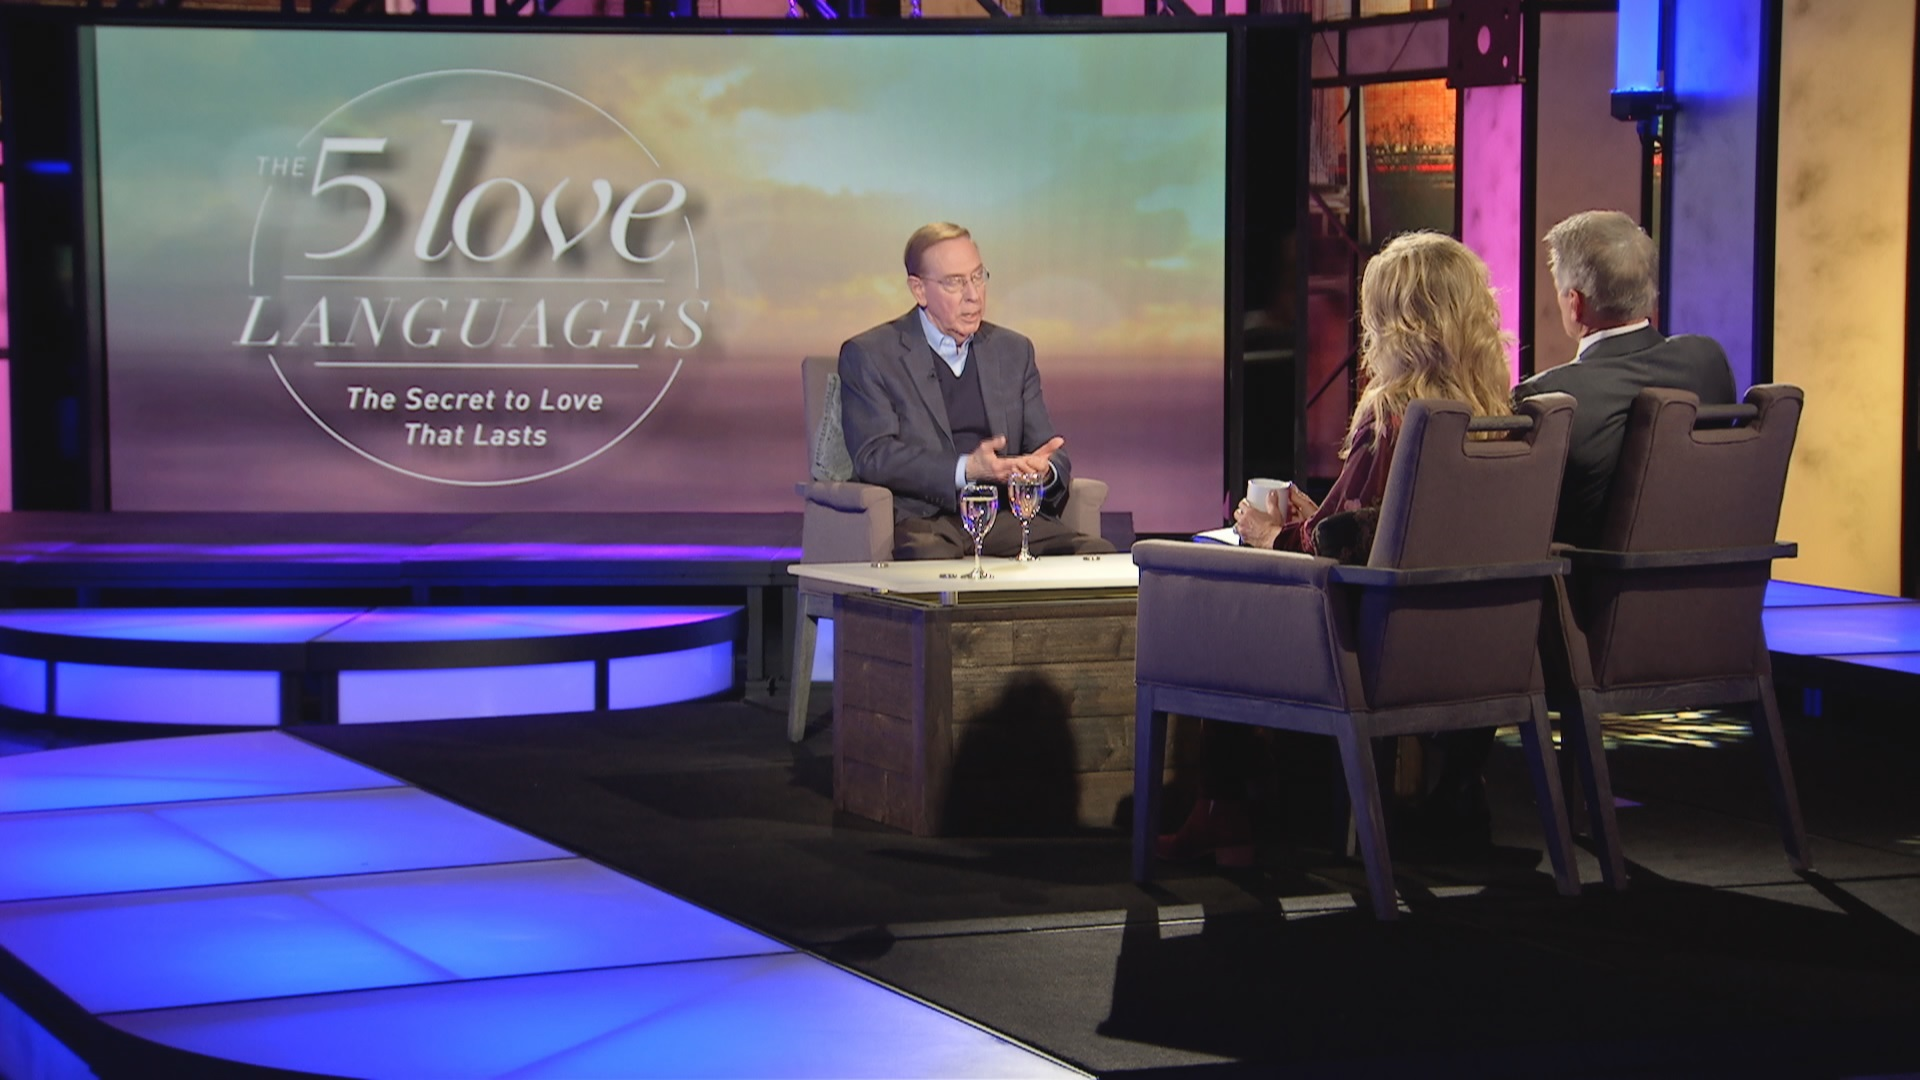 Gary Chapman: The 5 Love Languages